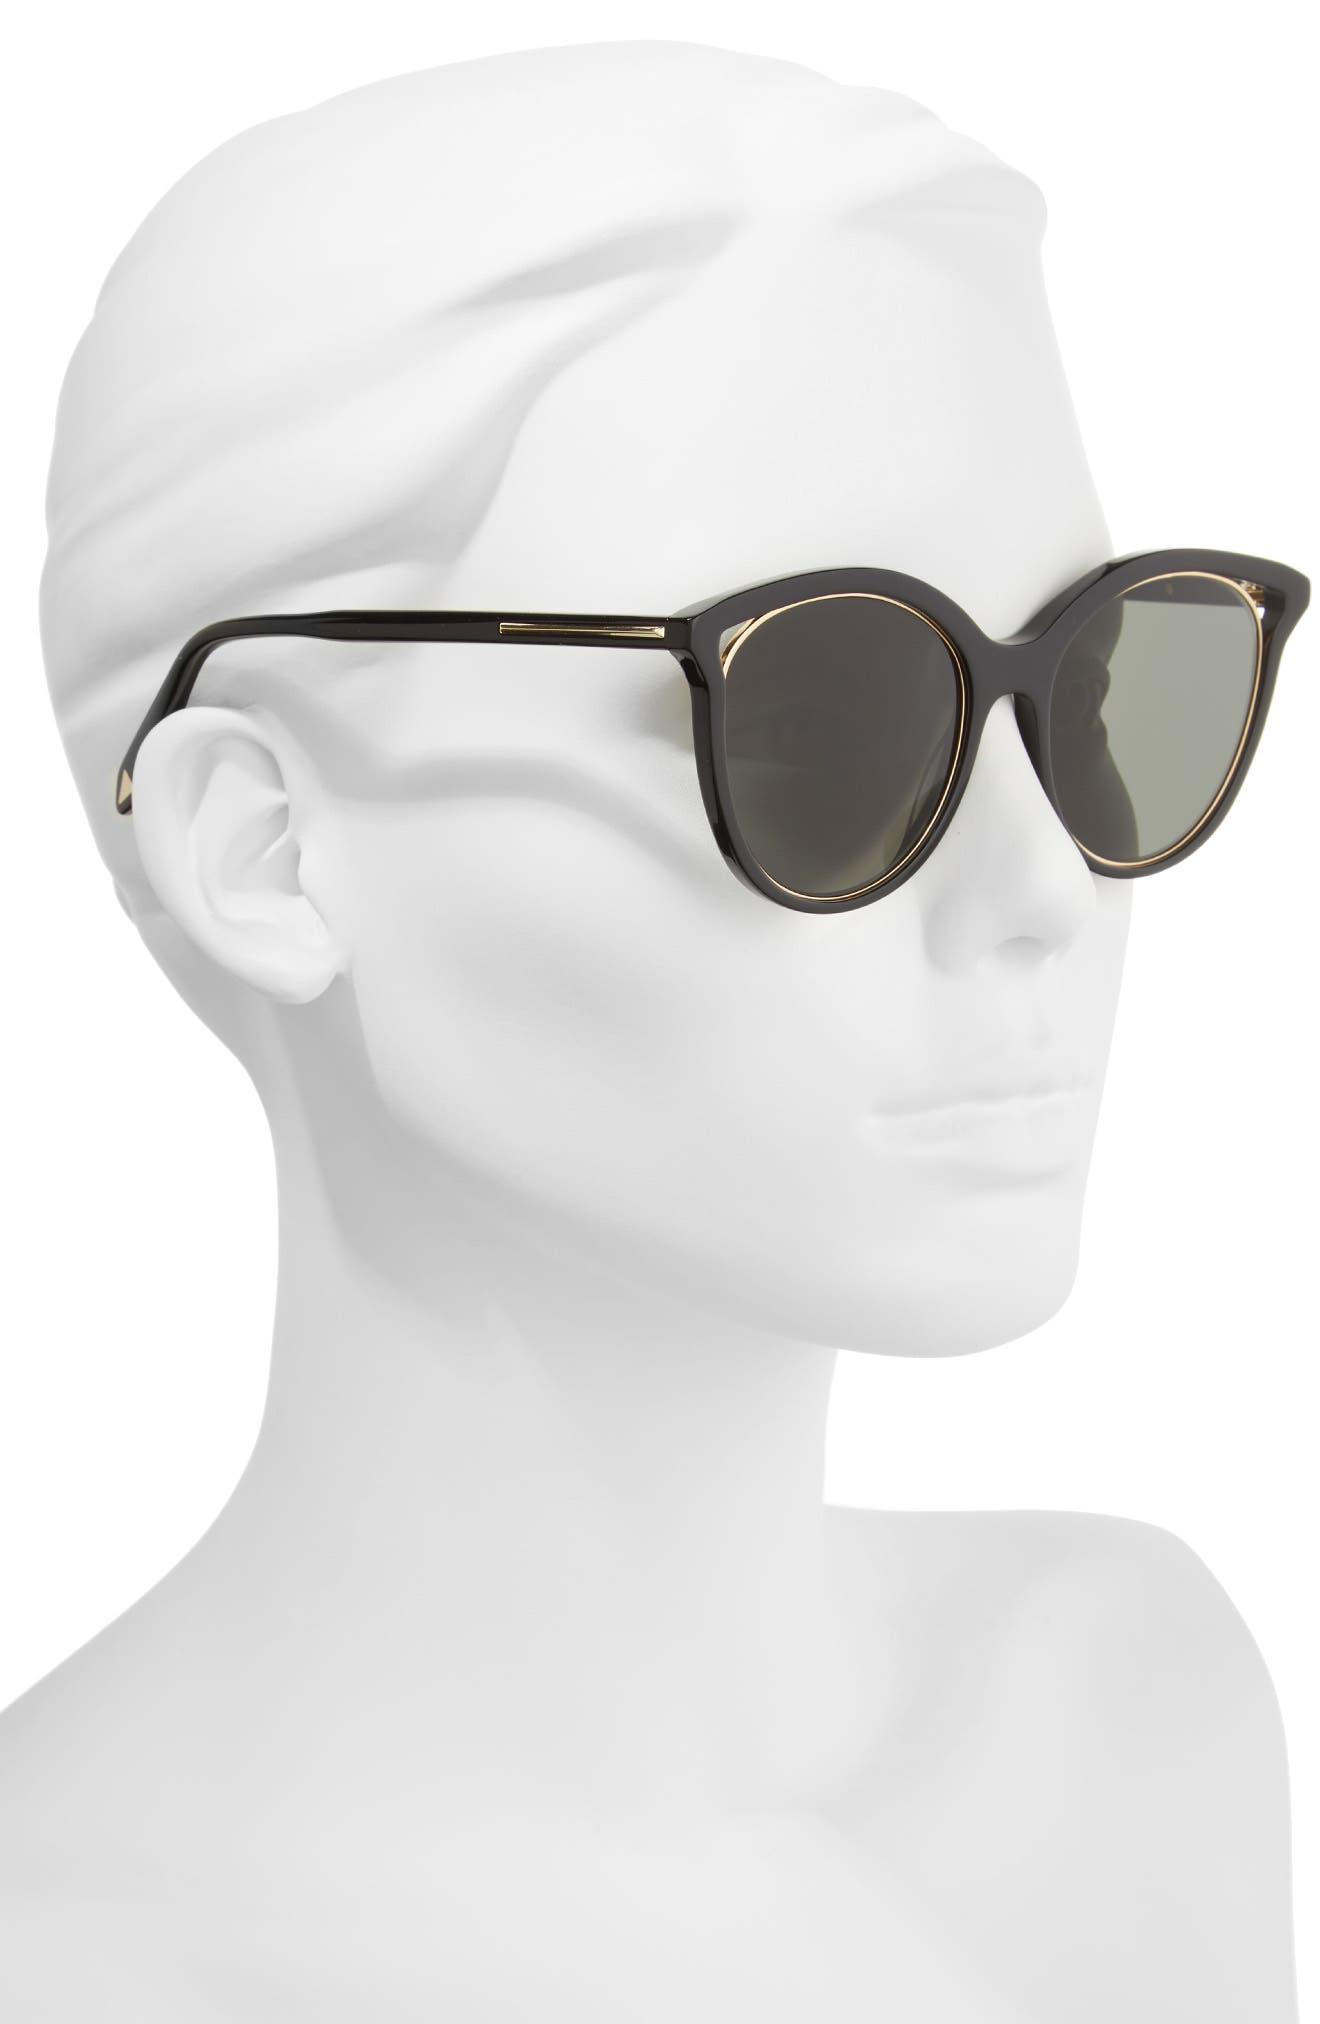 VICTORIA BECKHAM, Cutaway Kitten 54mm Cat Eye Sunglasses, Alternate thumbnail 2, color, BLACK/ GOLD